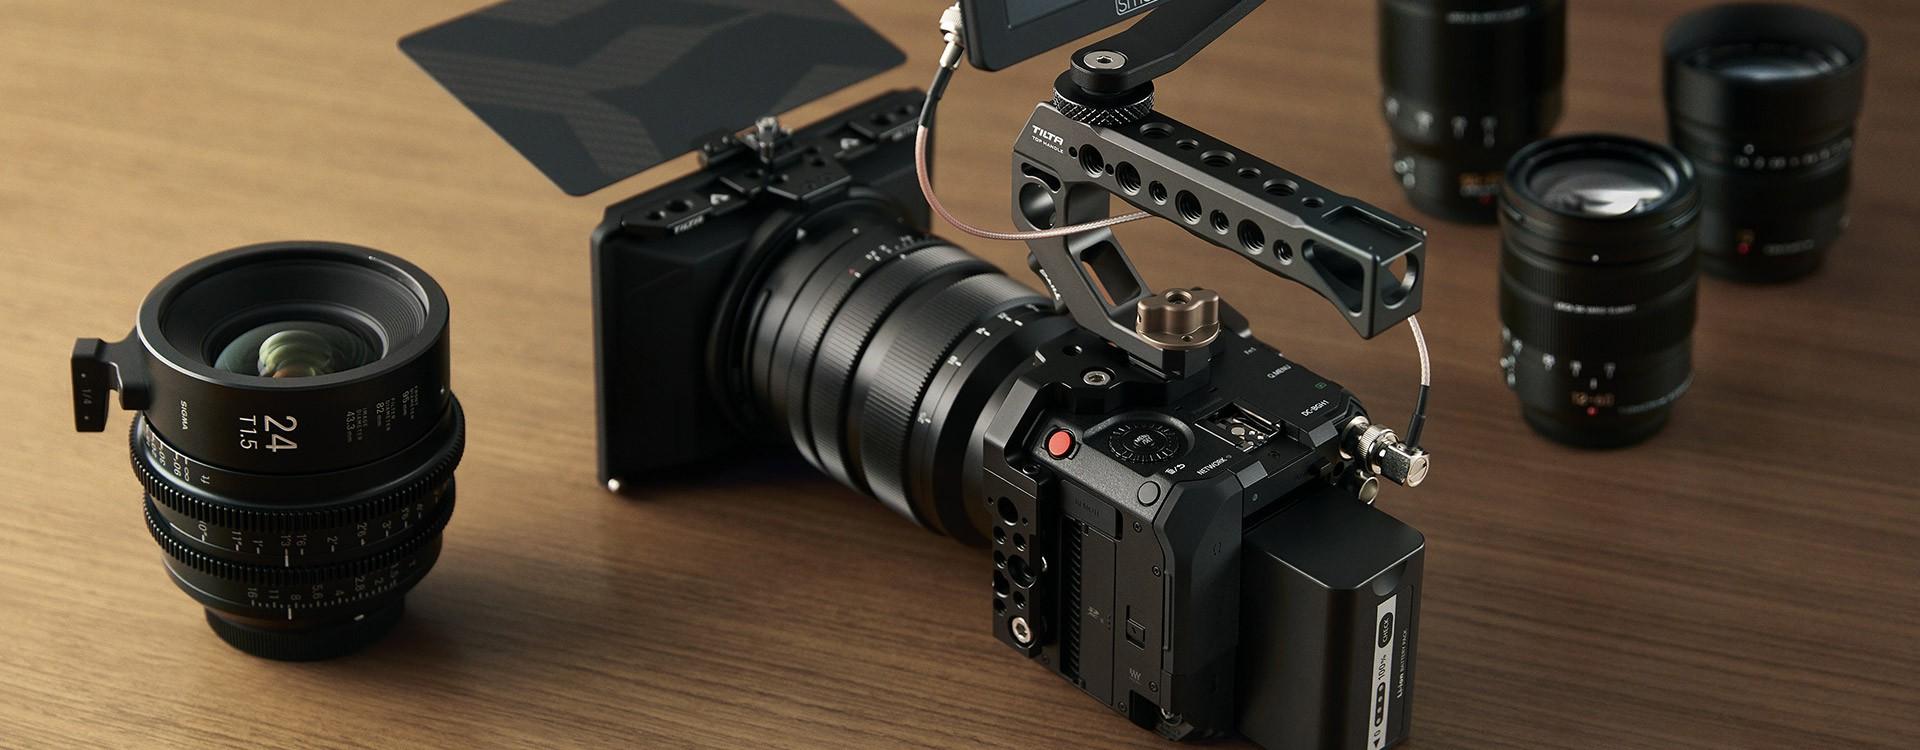 Panasonic annonce une caméra type box Lumix BGH1